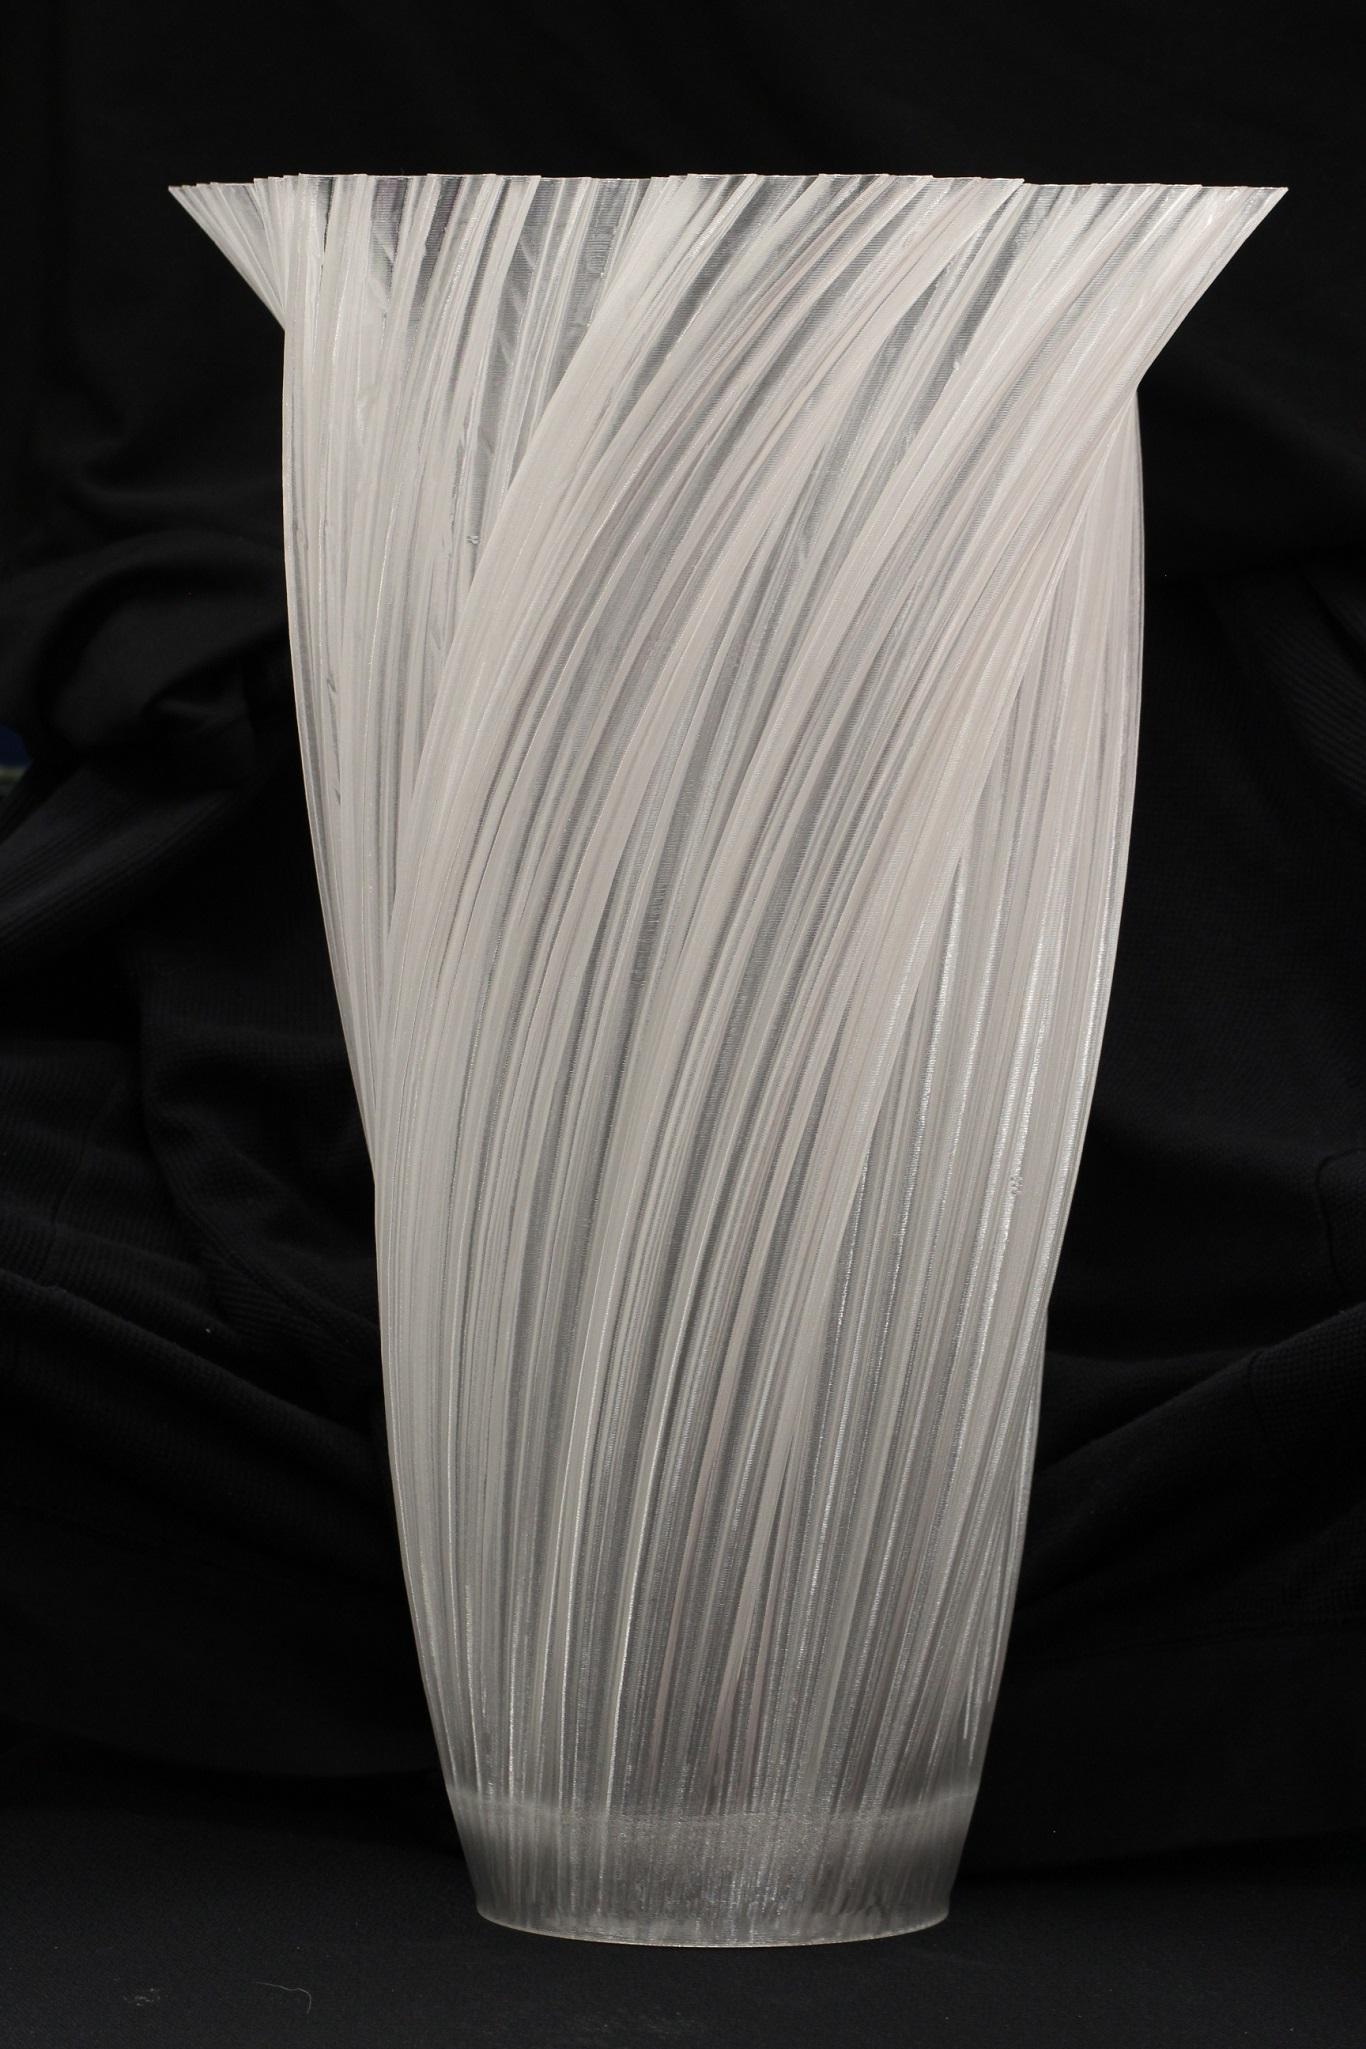 Clear PETG Vase, $300